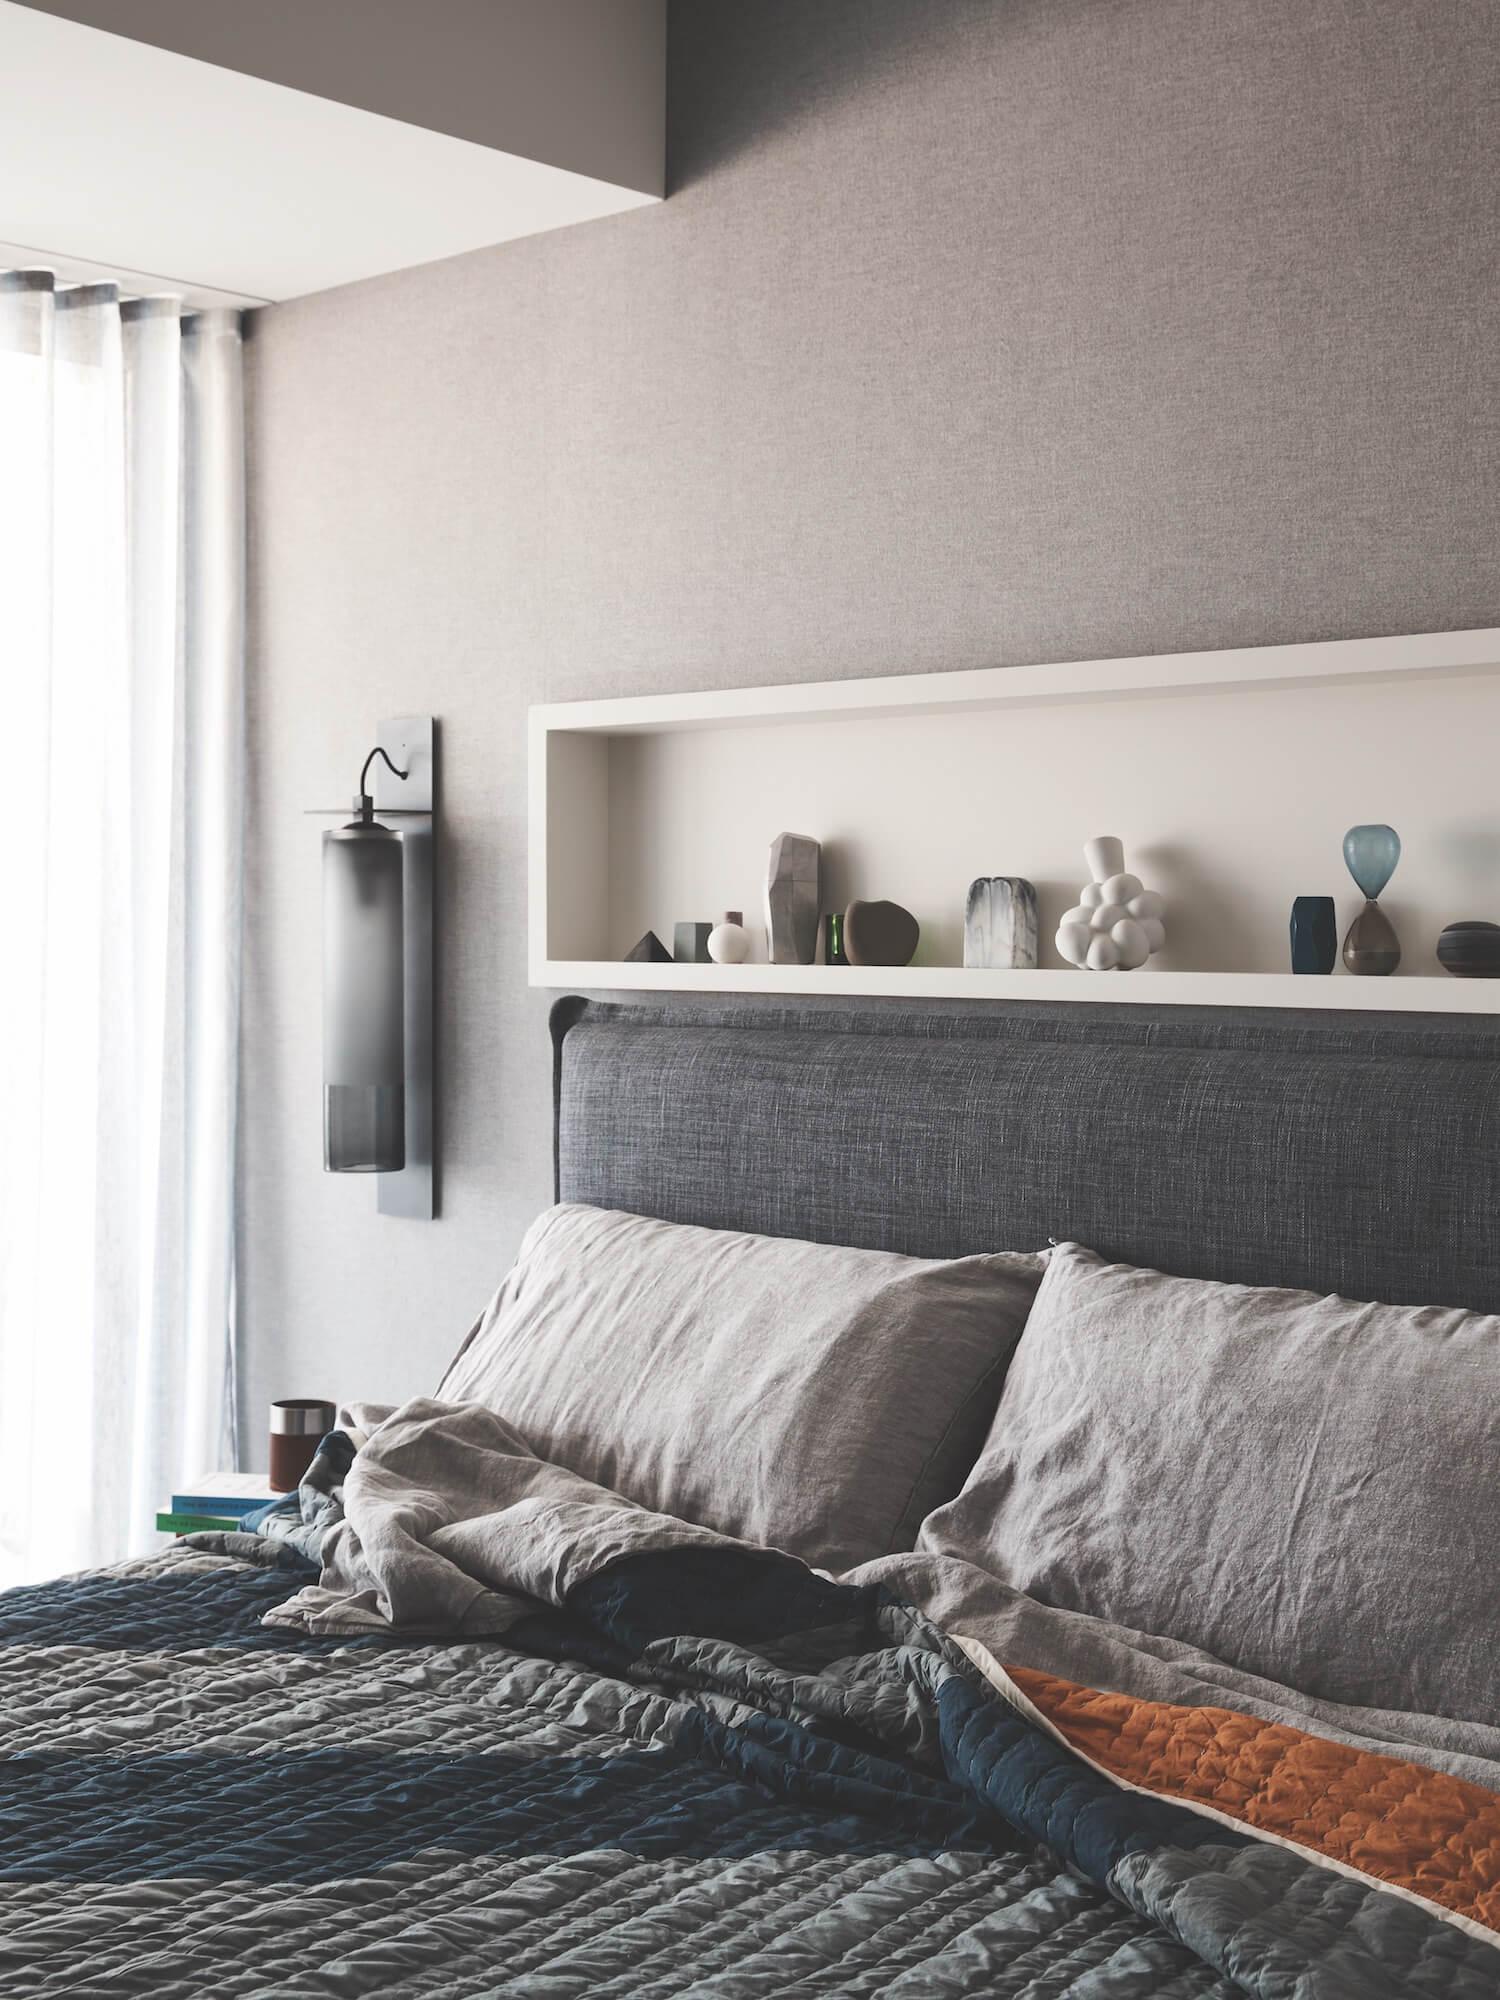 est living AIDA shortlist bondi residence tommarkhenry 1